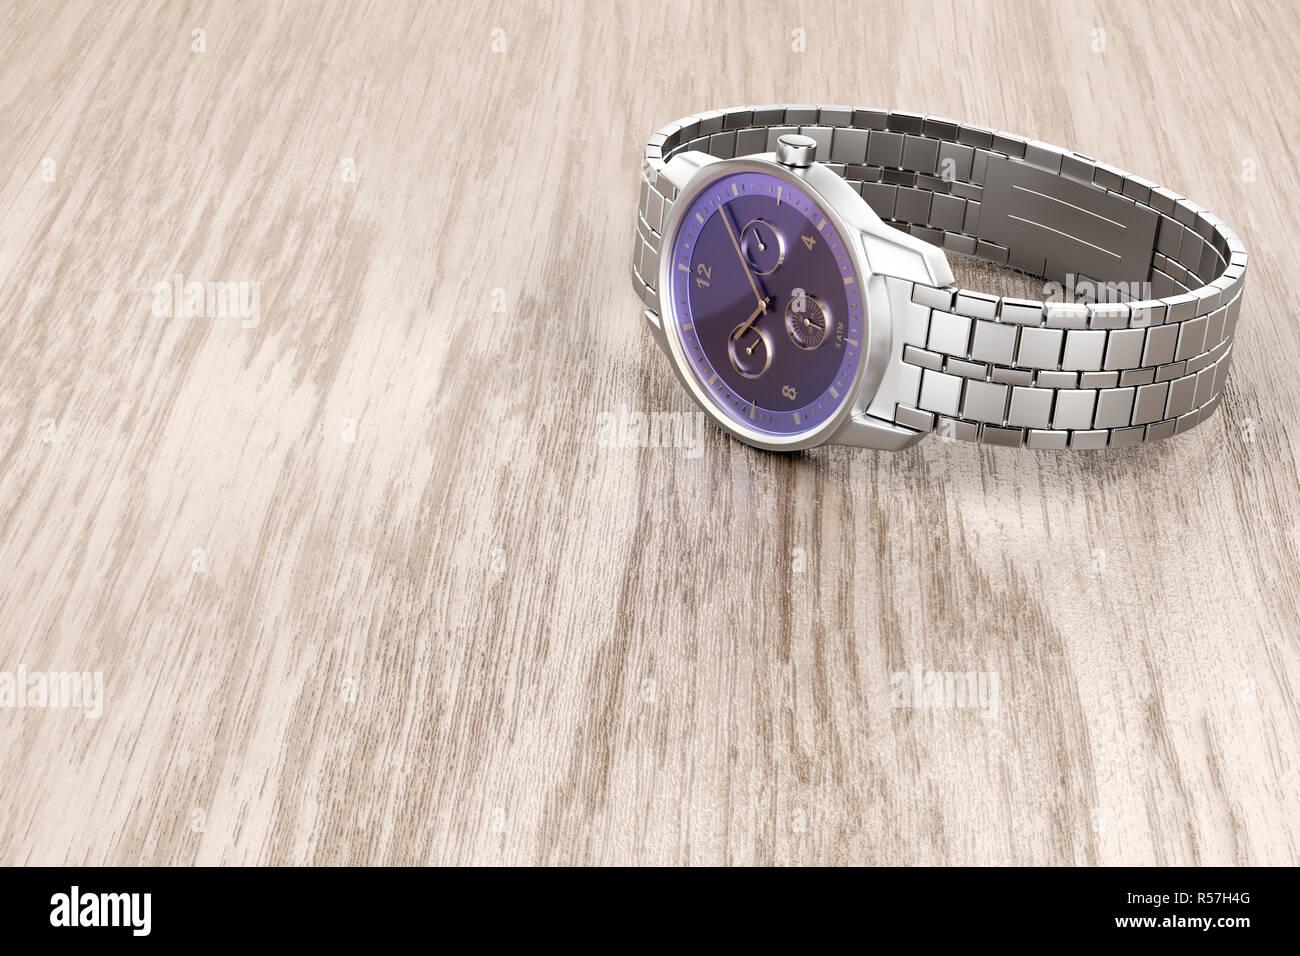 Silver wristwatch - Stock Image